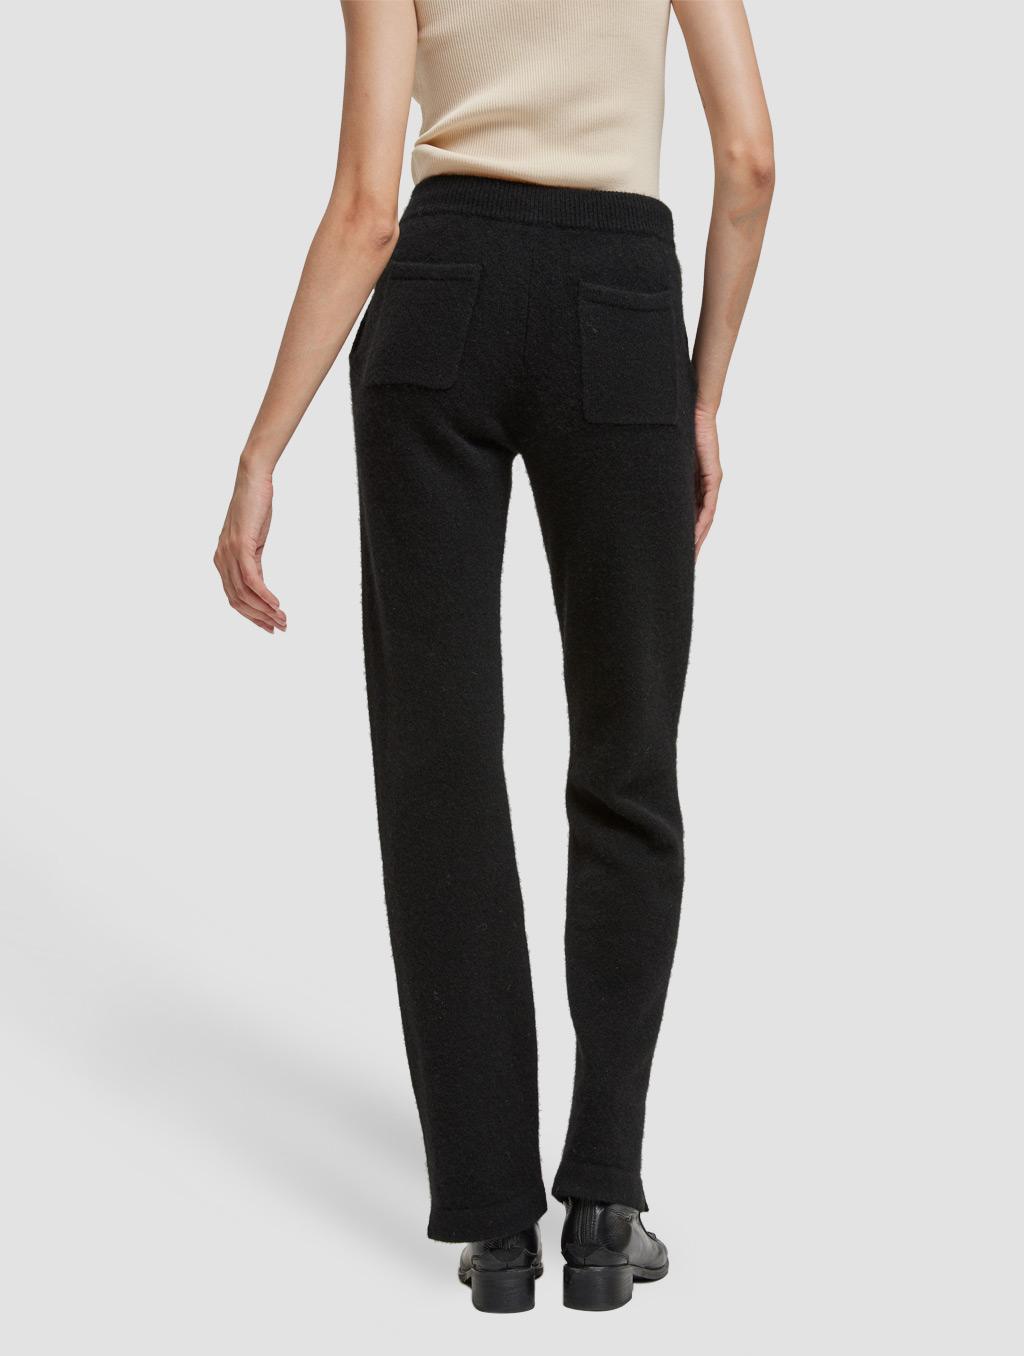 Drawstring straight yak wool pants-back-black